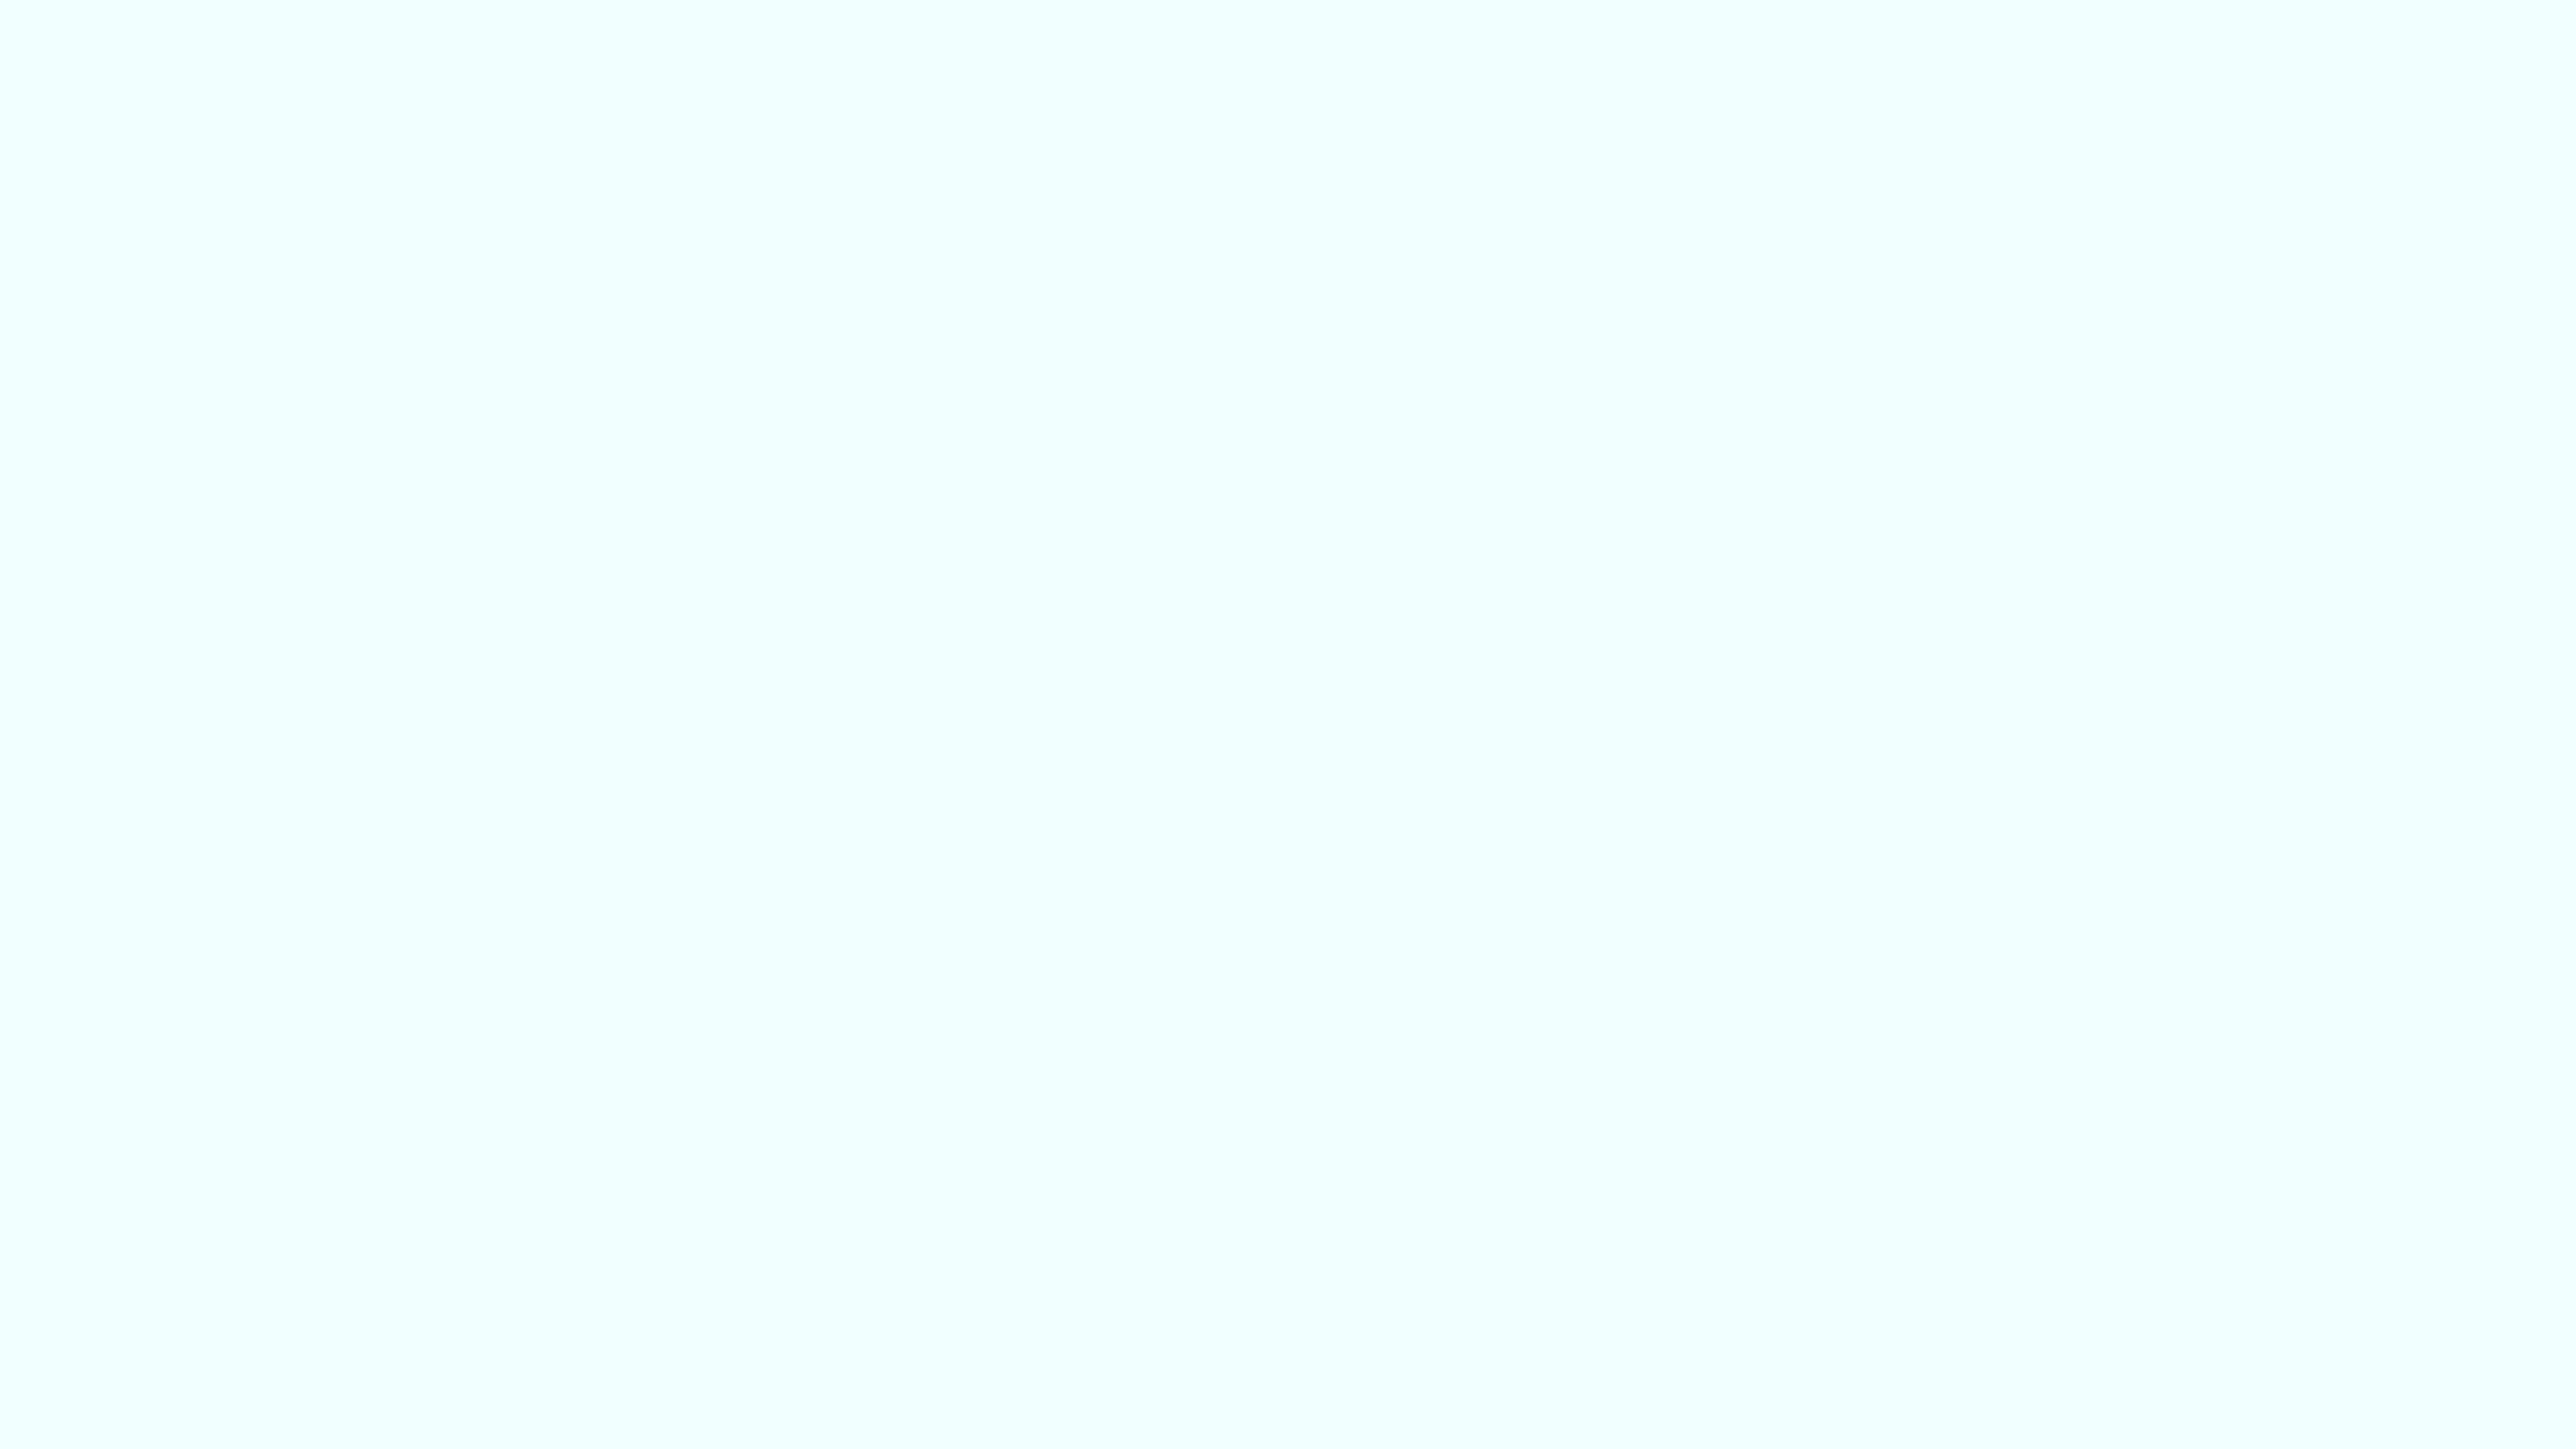 3840x2160 Azure Mist Solid Color Background